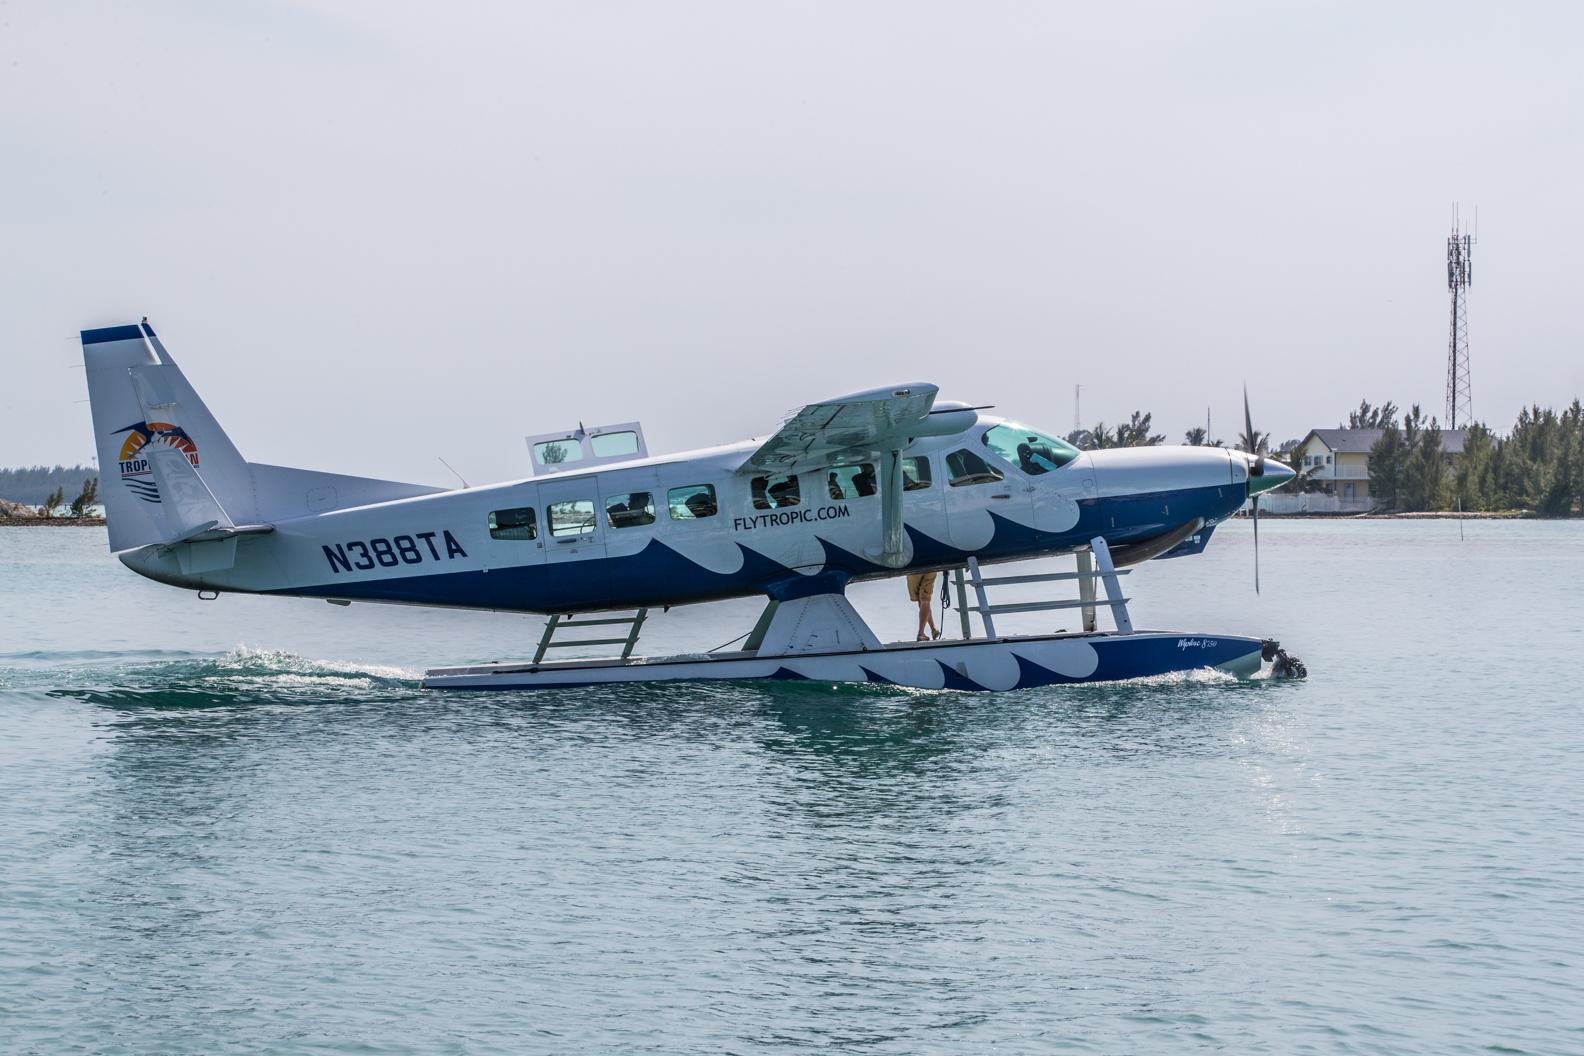 NN-148